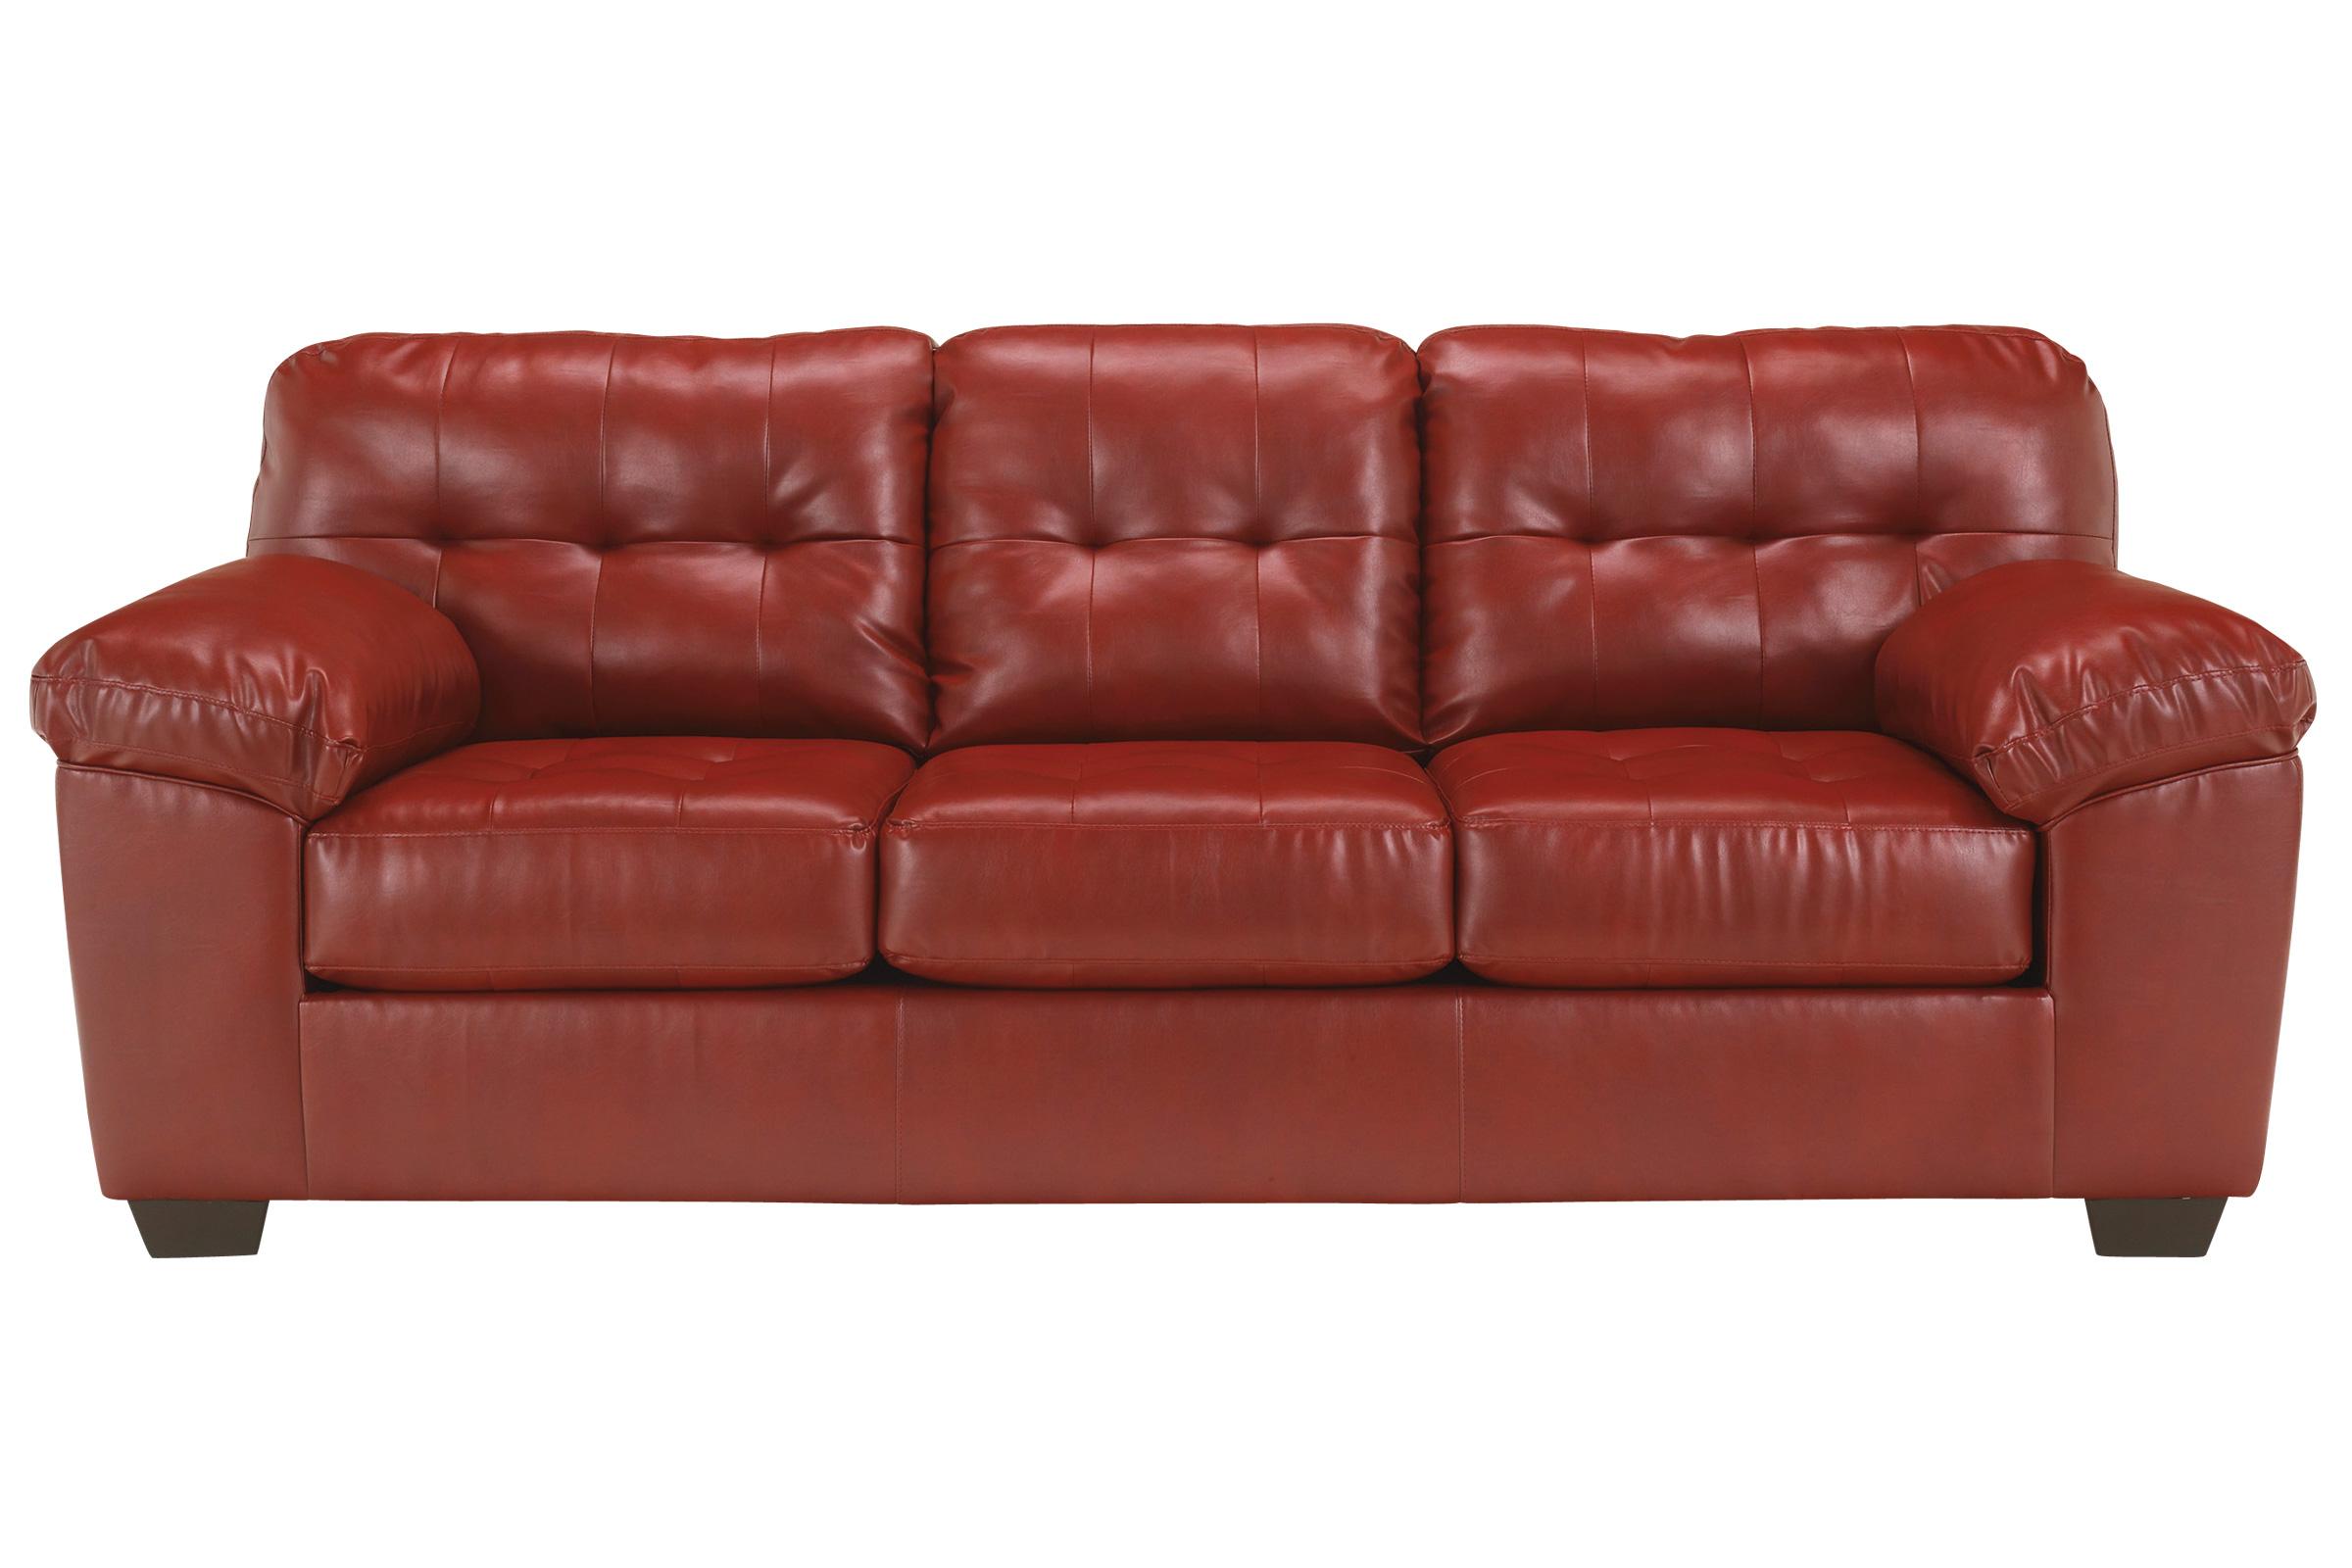 Vance Bonded Leather Sofa